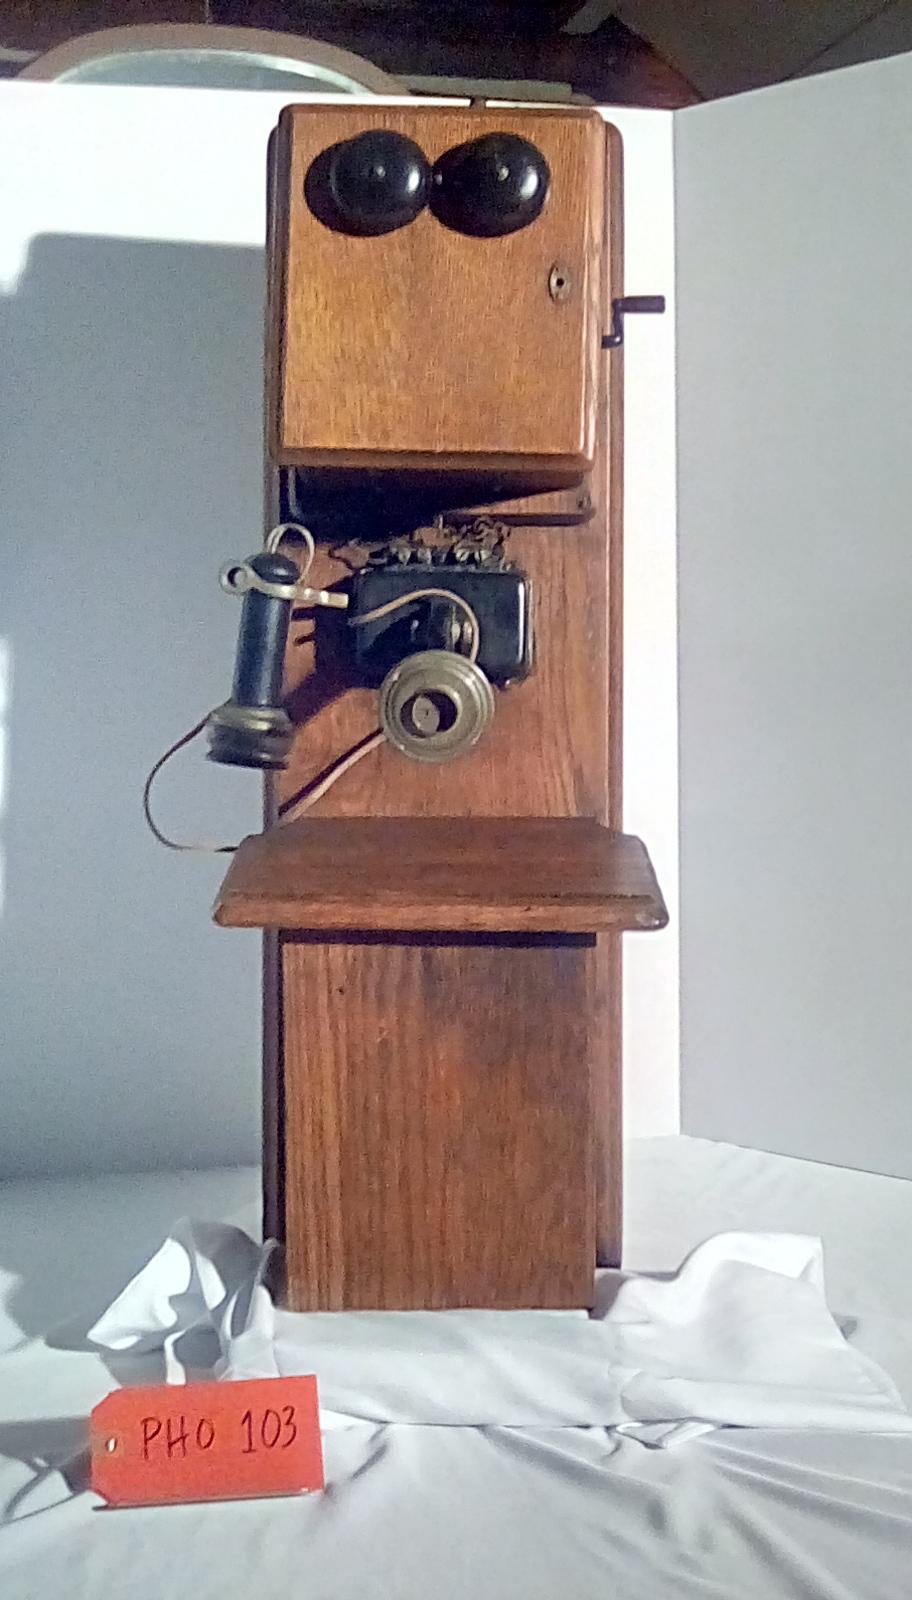 PHO 103 wooden wall crank phone